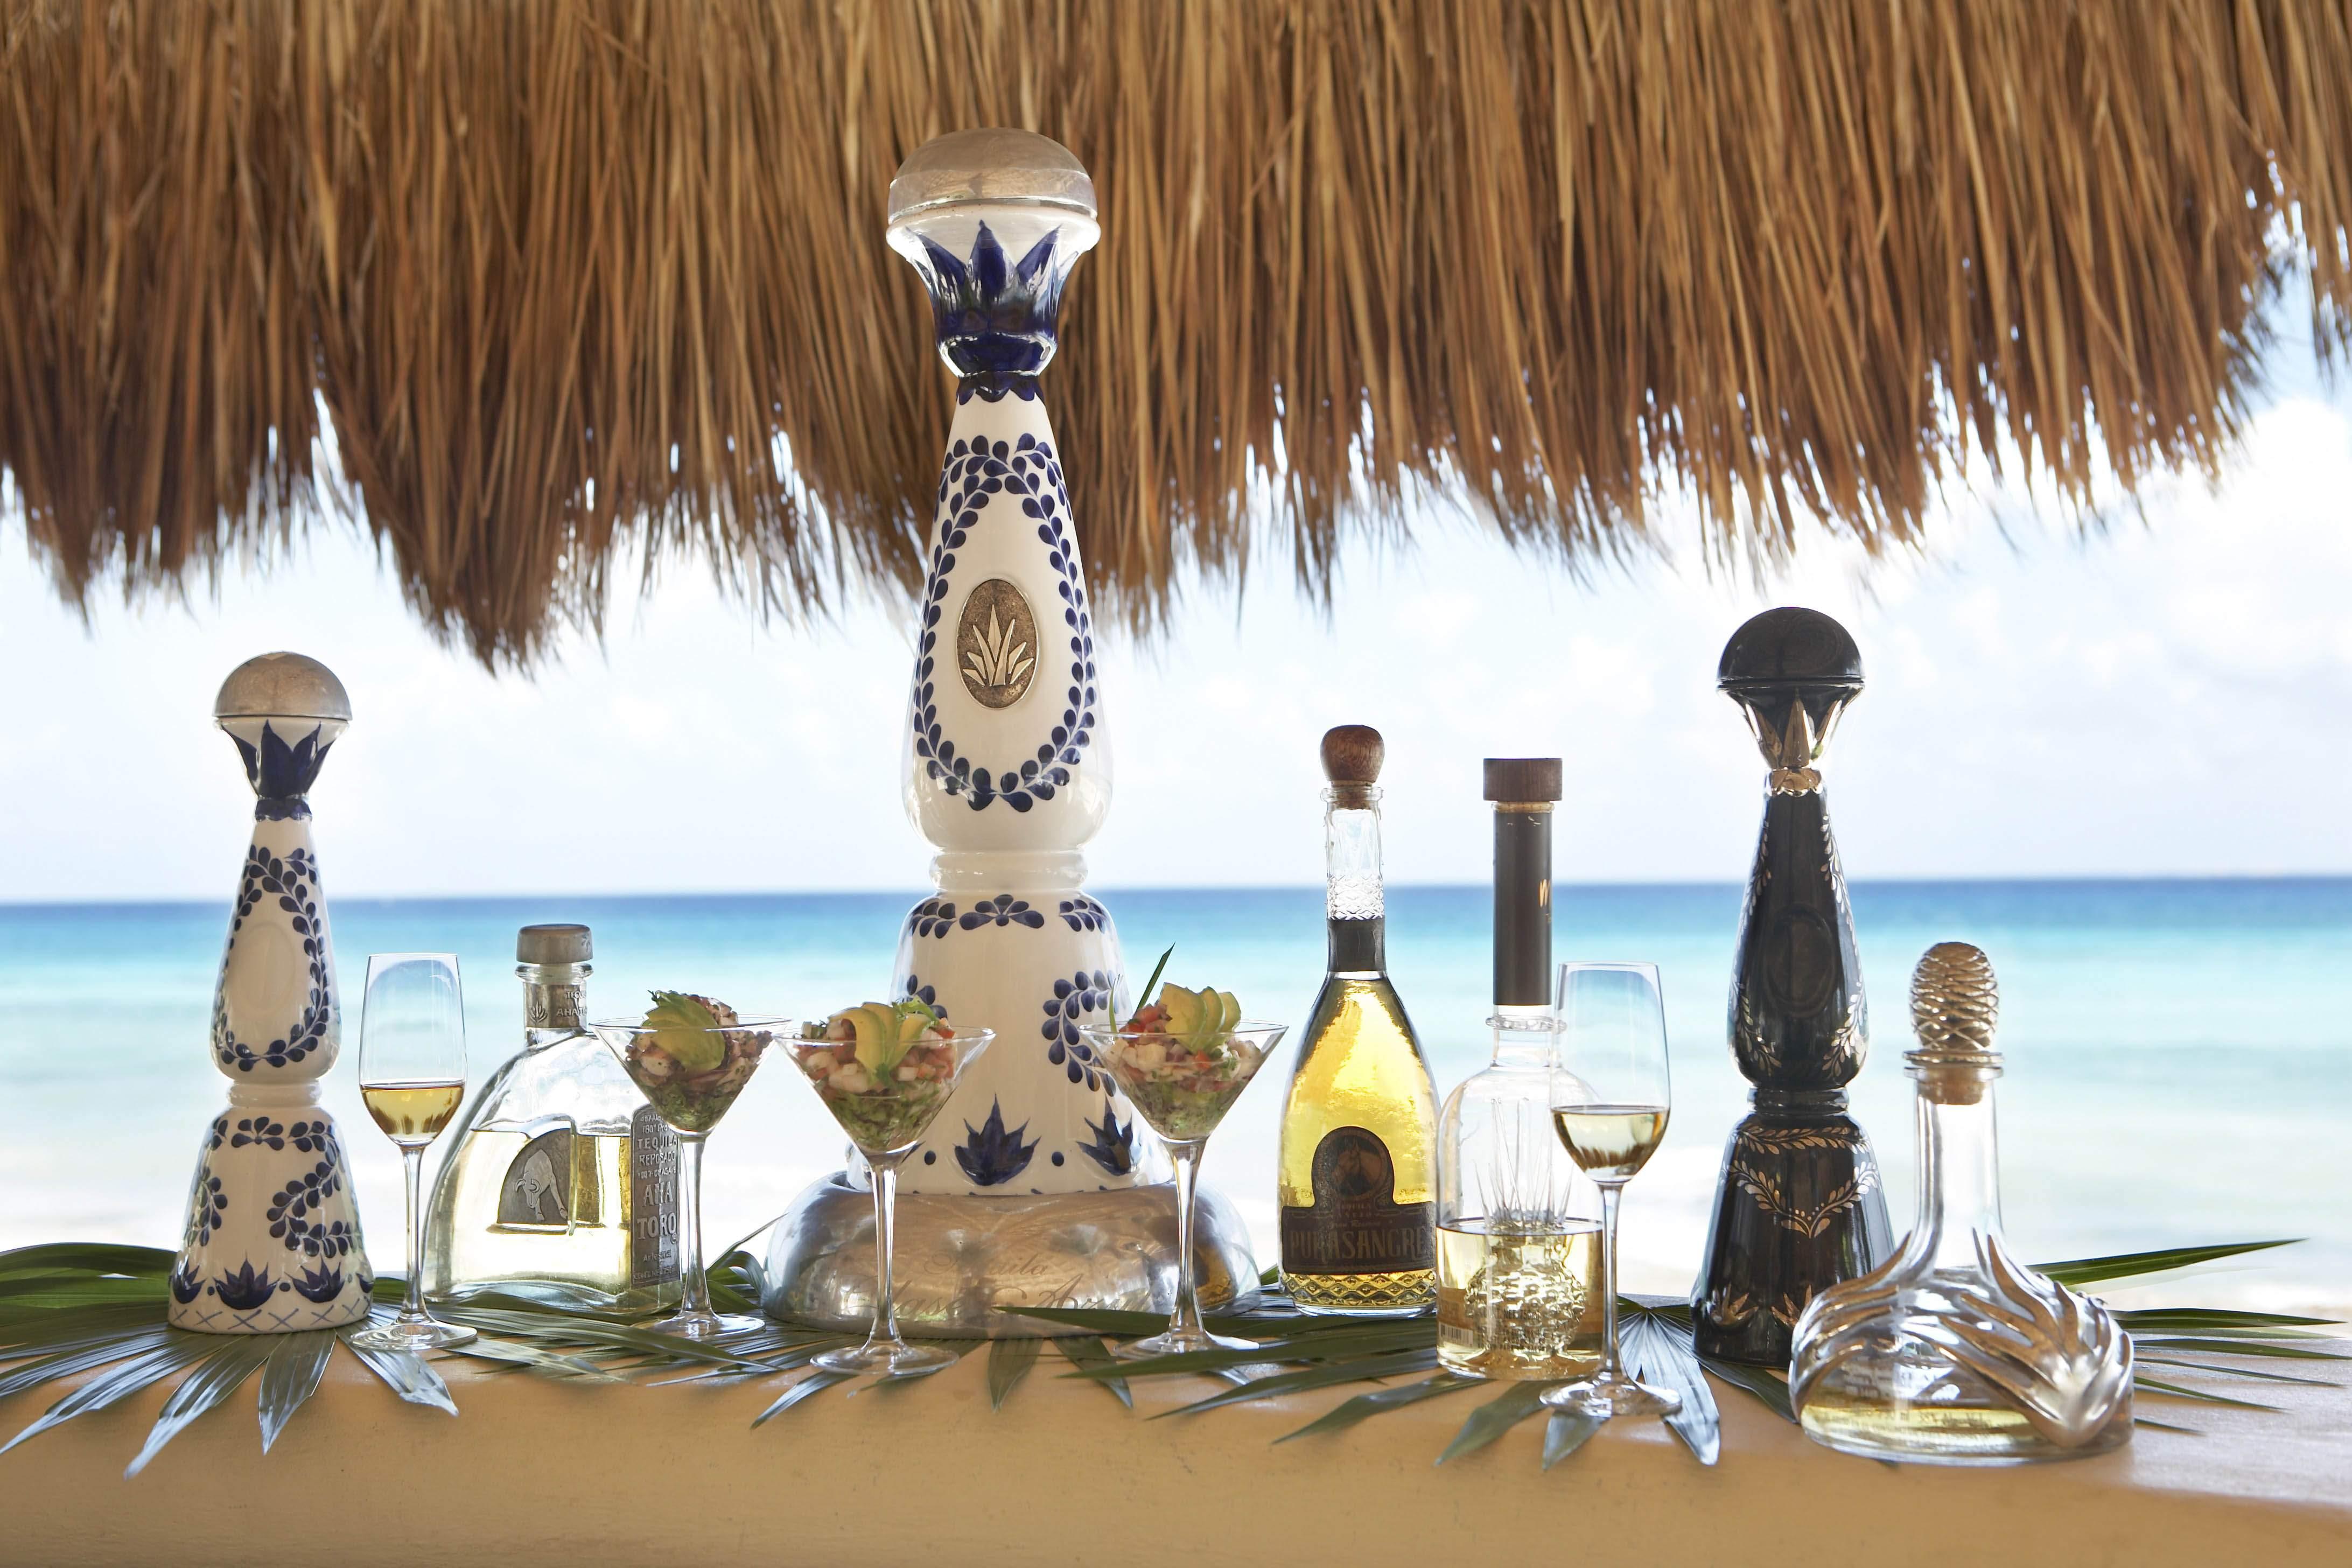 Courtesy of Viceroy Riviera Maya